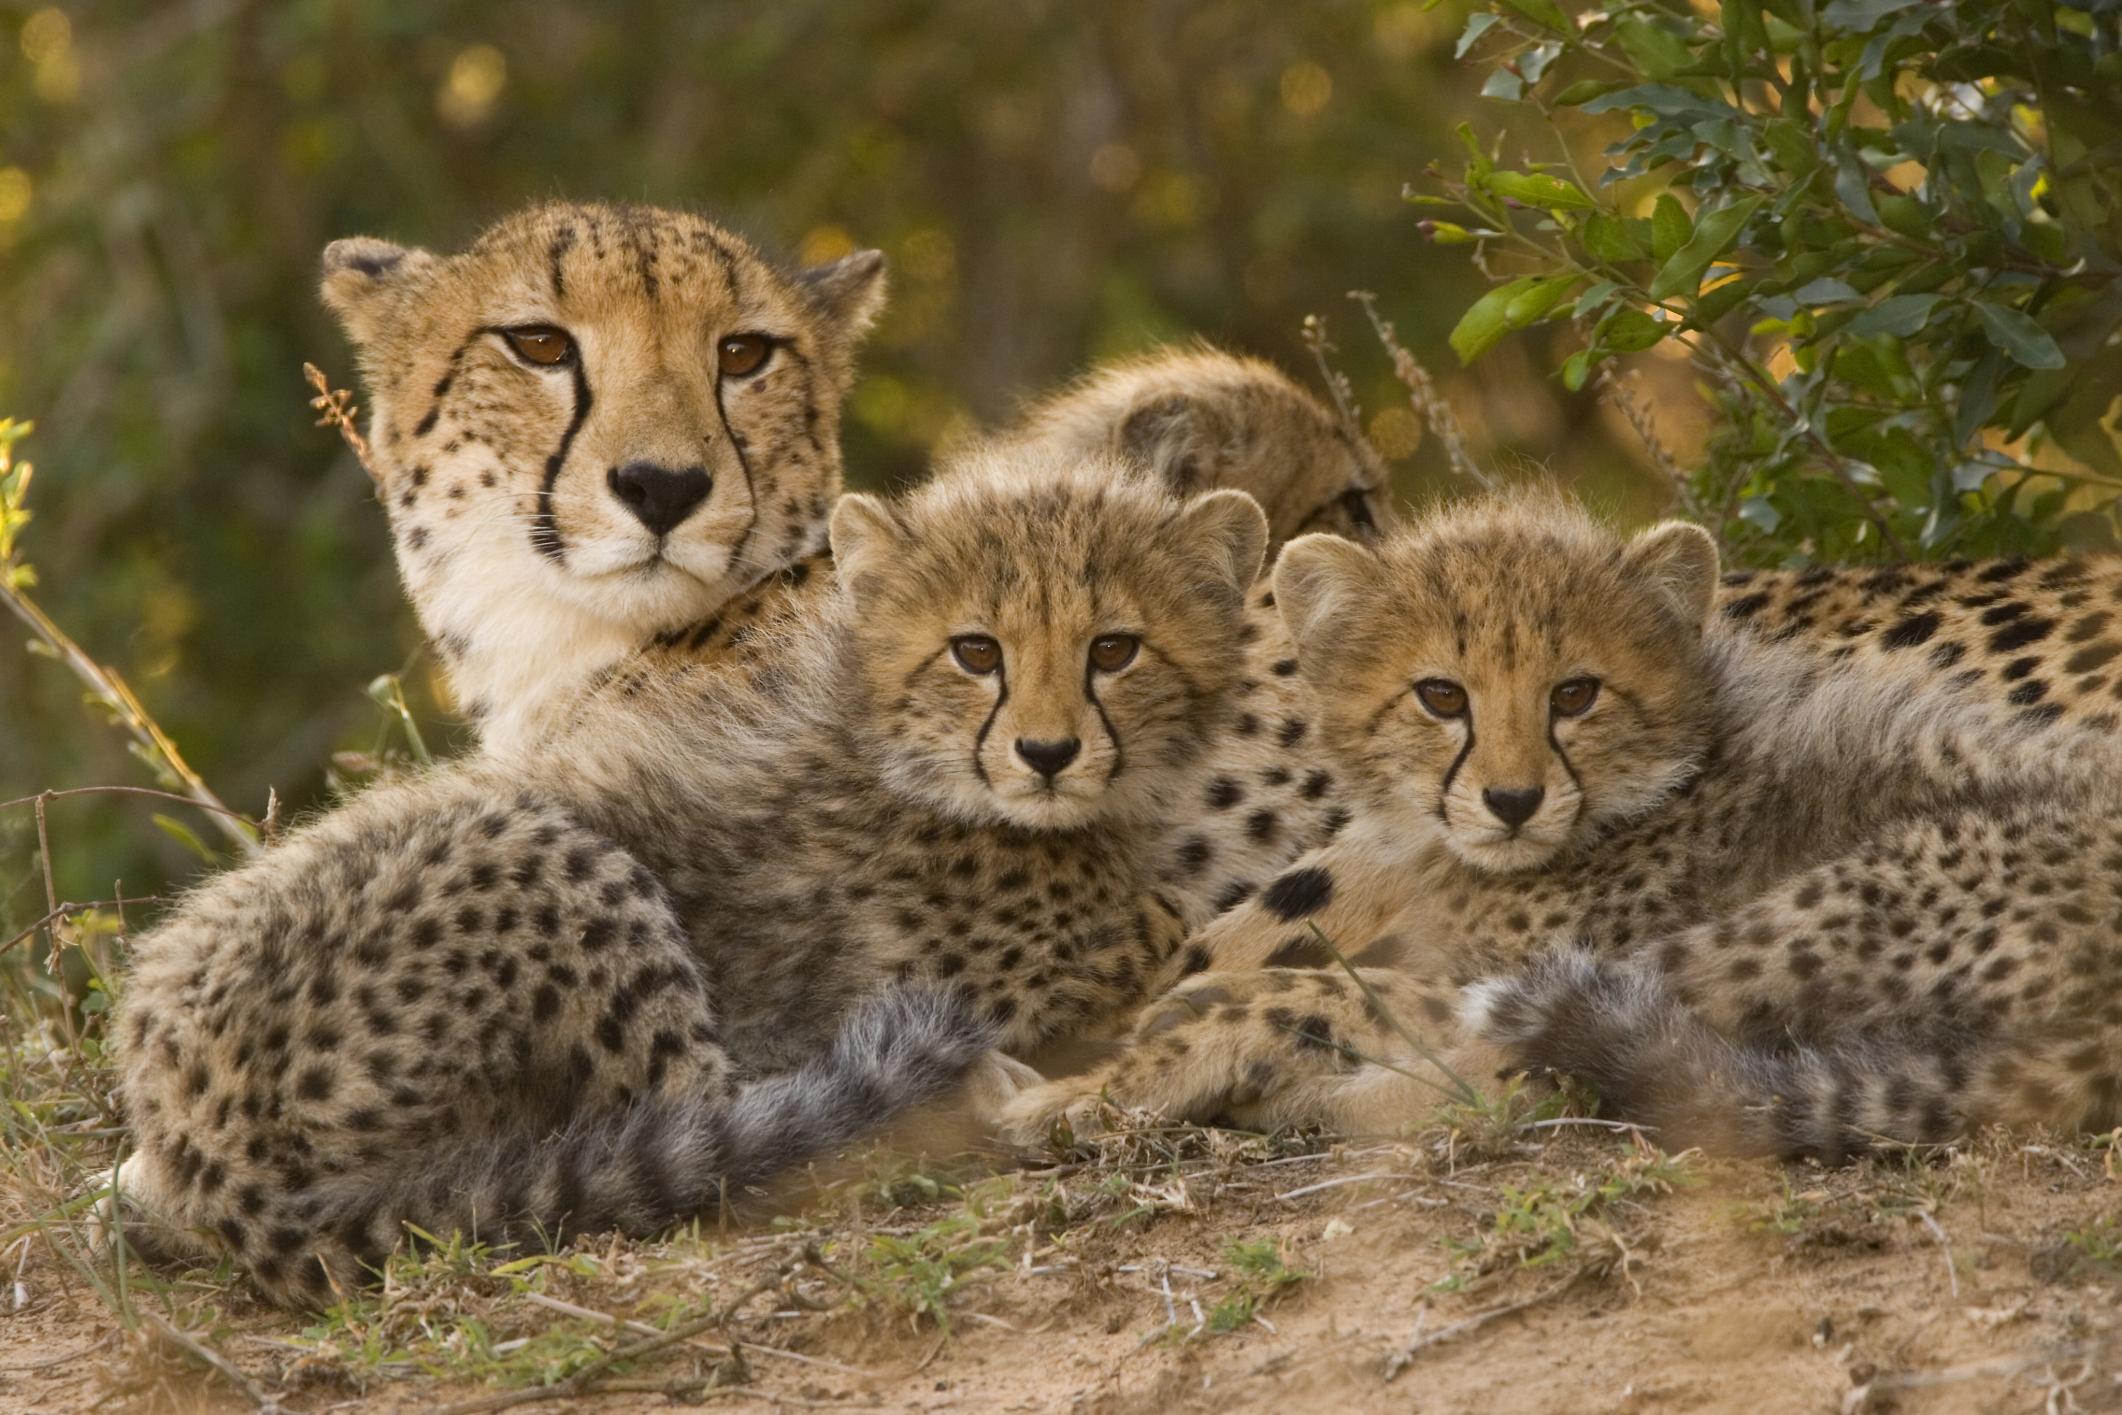 are cheetahs clones of